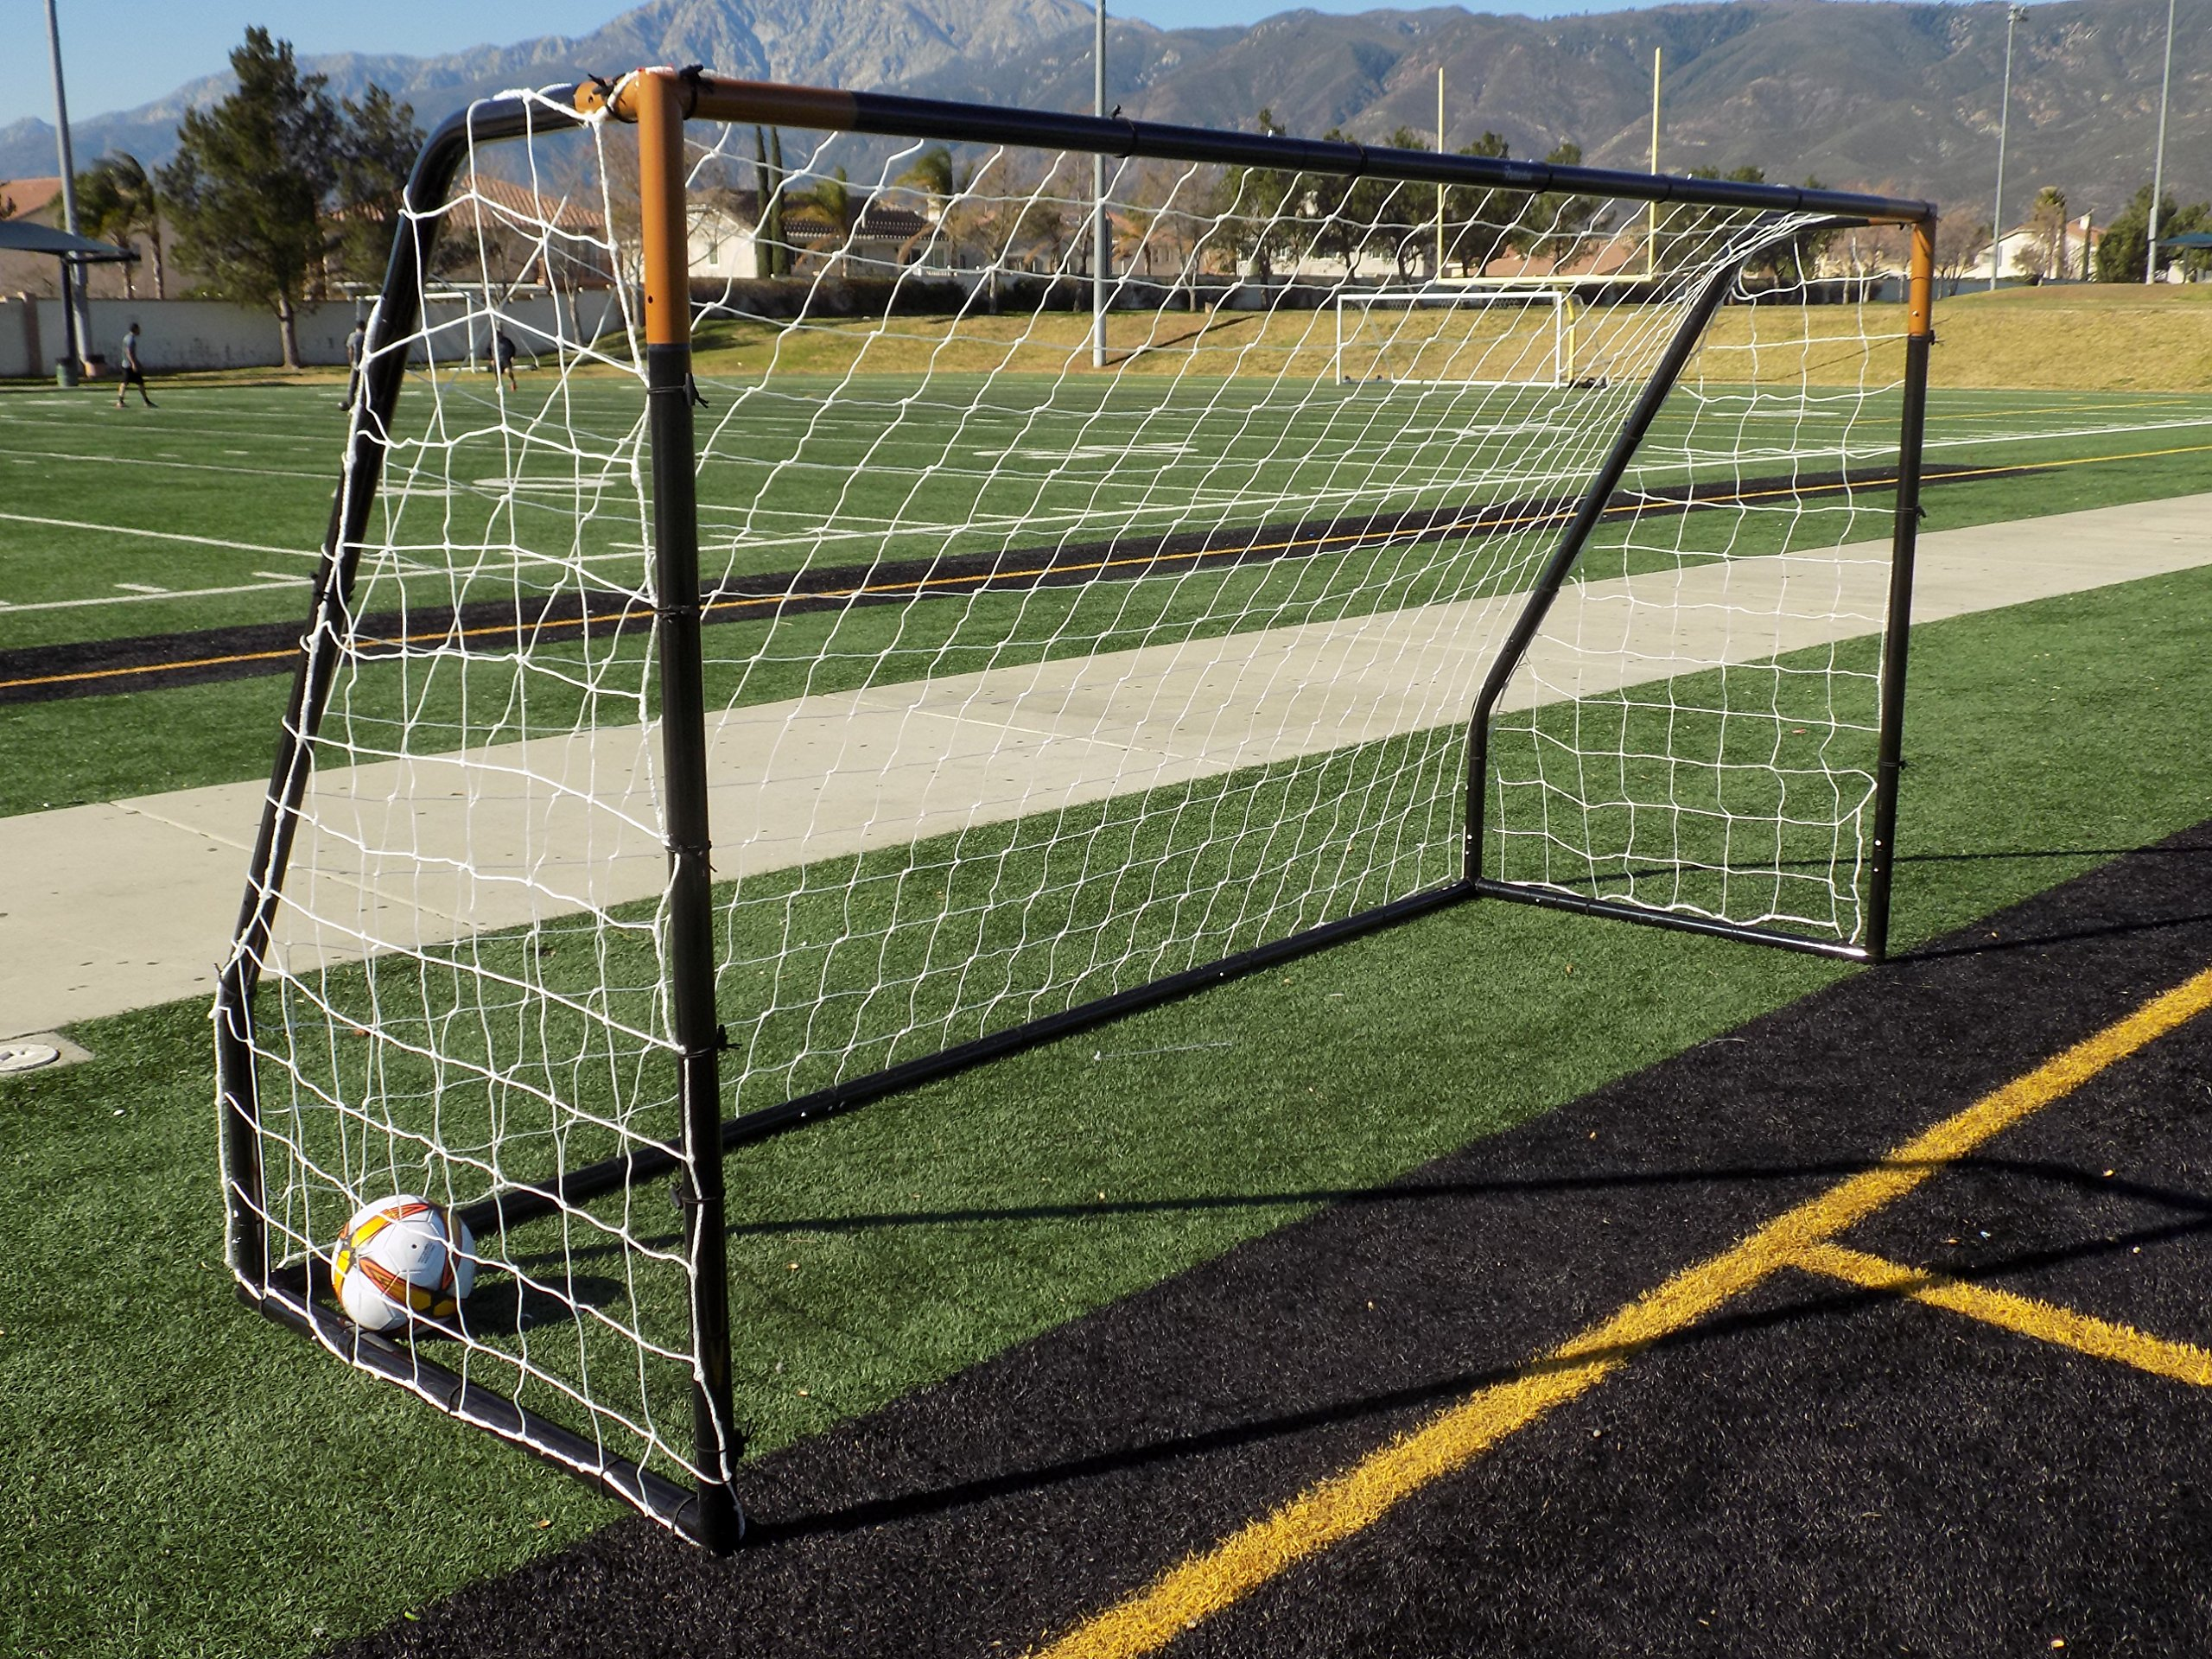 Vallerta Premier 12 X 6 Ft. AYSO Youth Regulation Size Soccer Goal w/Weatherproof 4mm Net. 50MM Diameter Black Powder Coated/Corrosion Resistant Frame. 12x6 Foot Practice Aid(1Net)ONE YEAR WARRANTY!